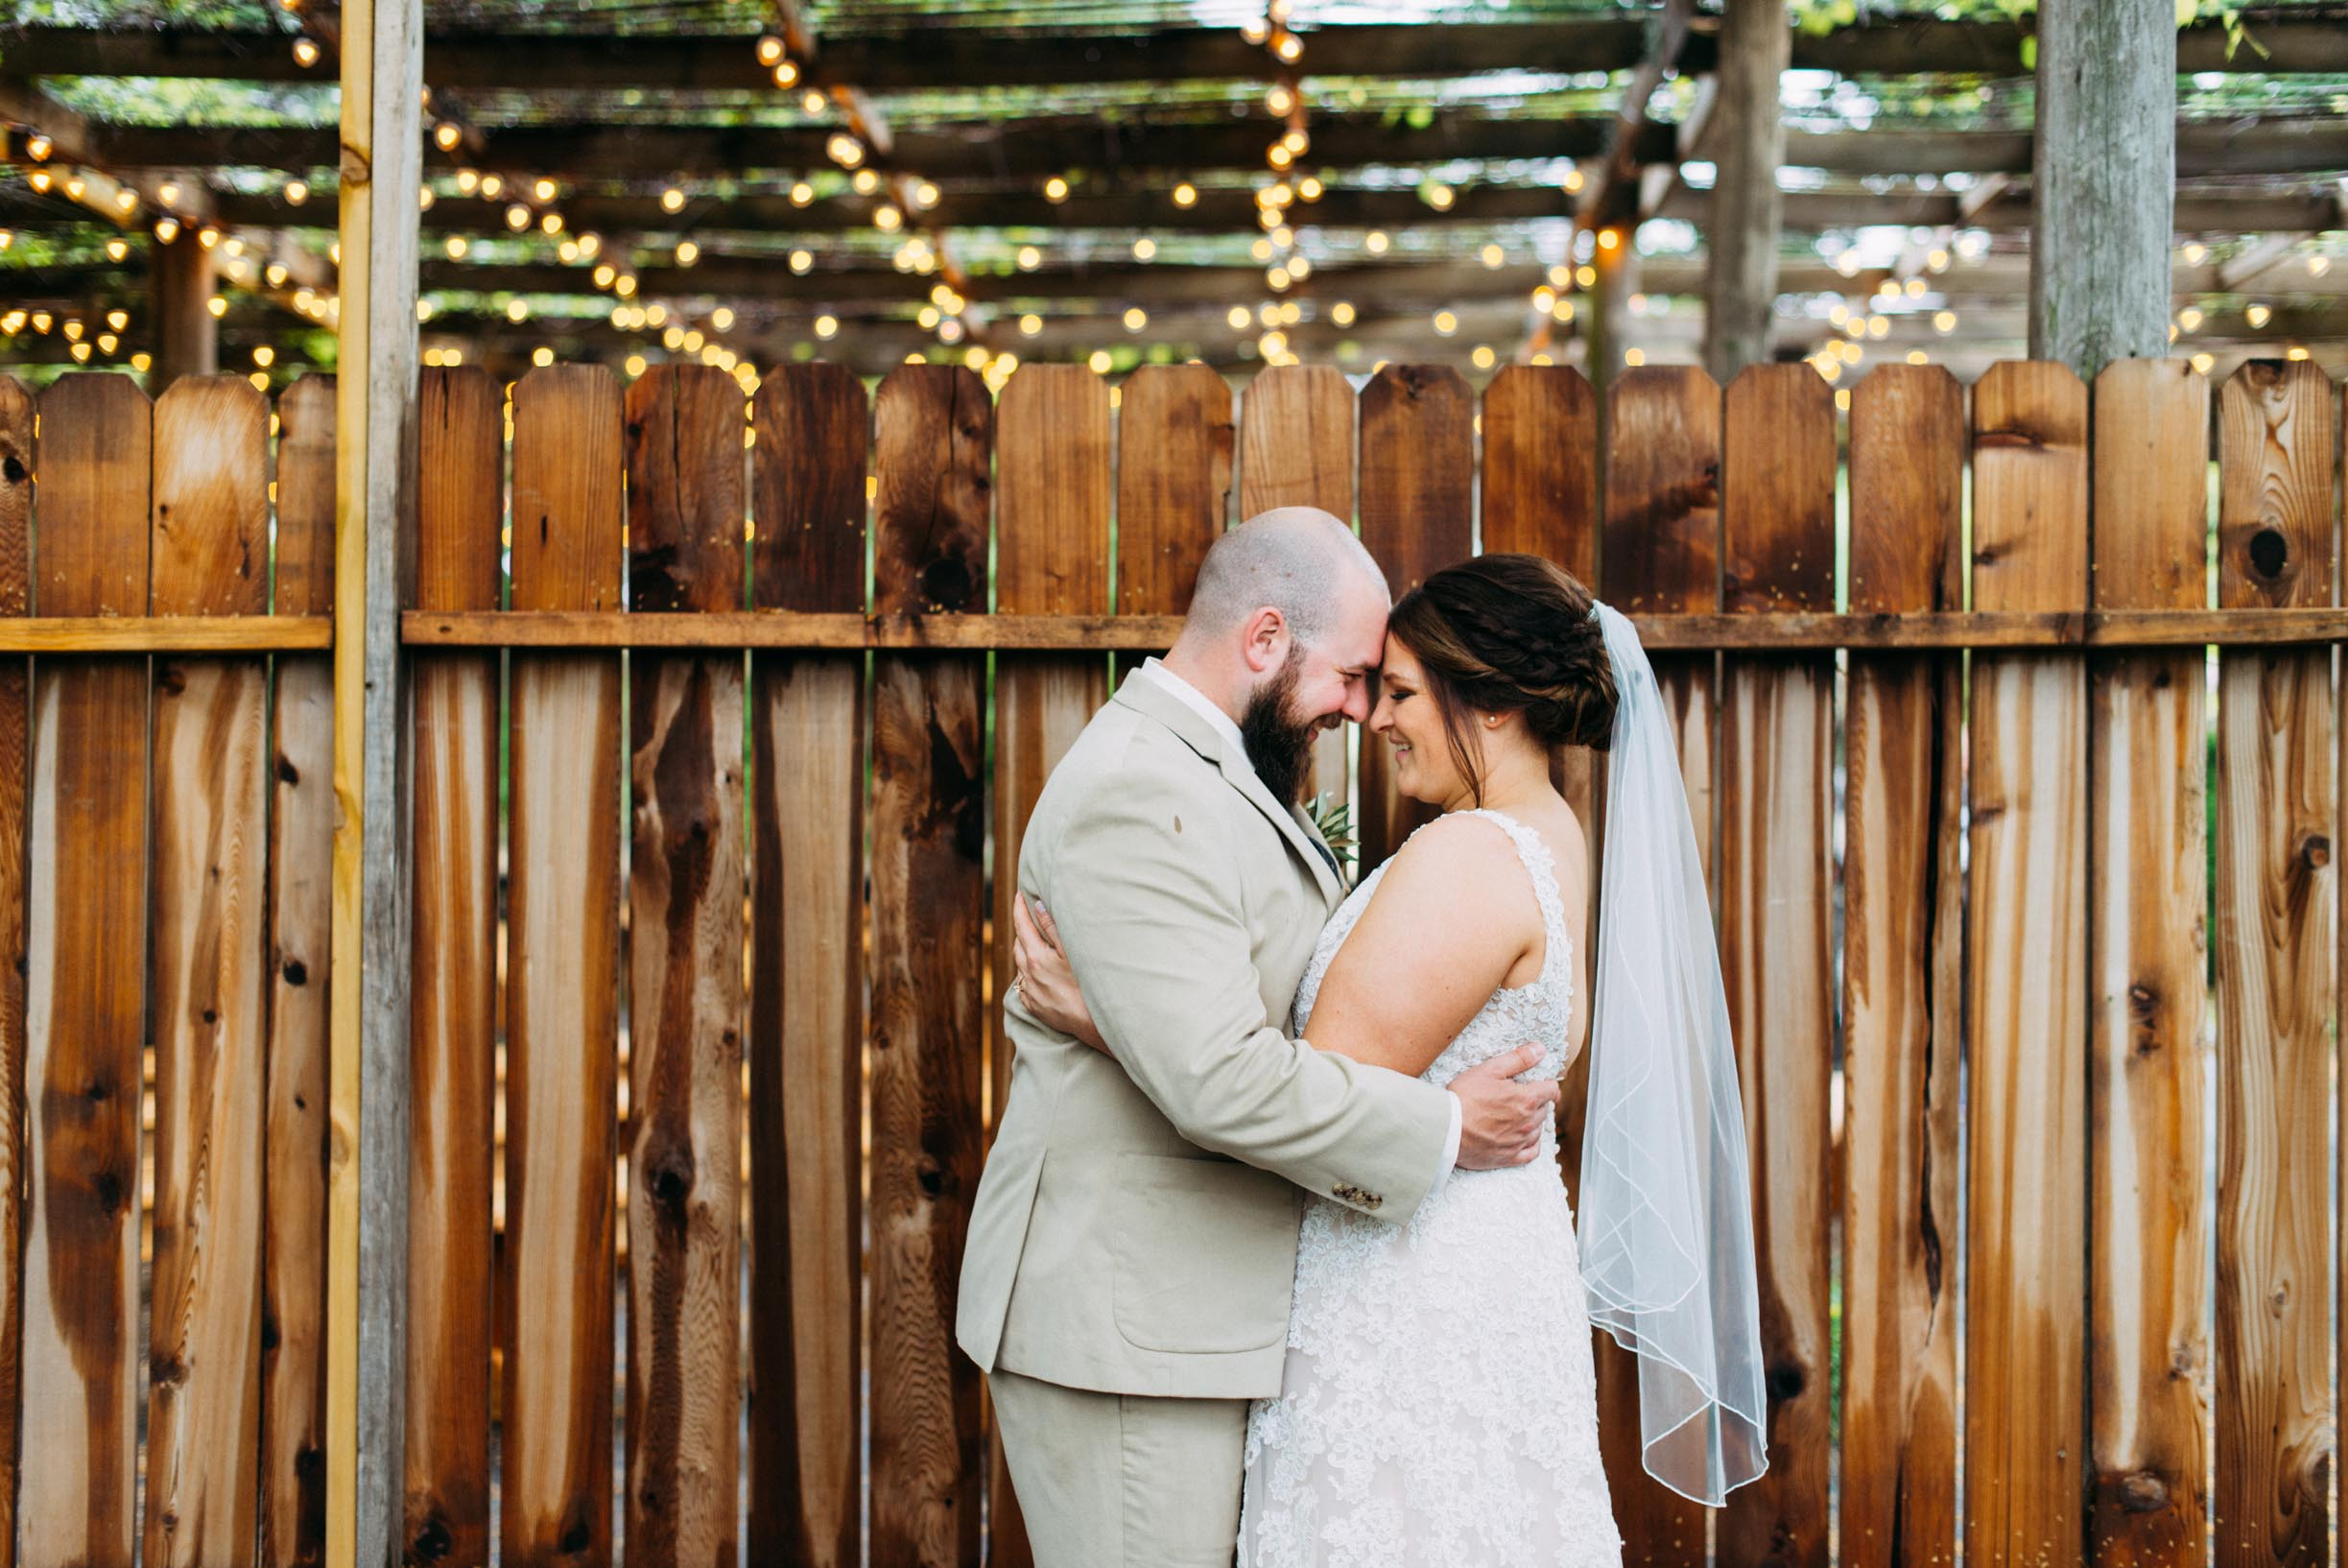 25-Jess_Jeremy_Minnesota_Wedding.jpg